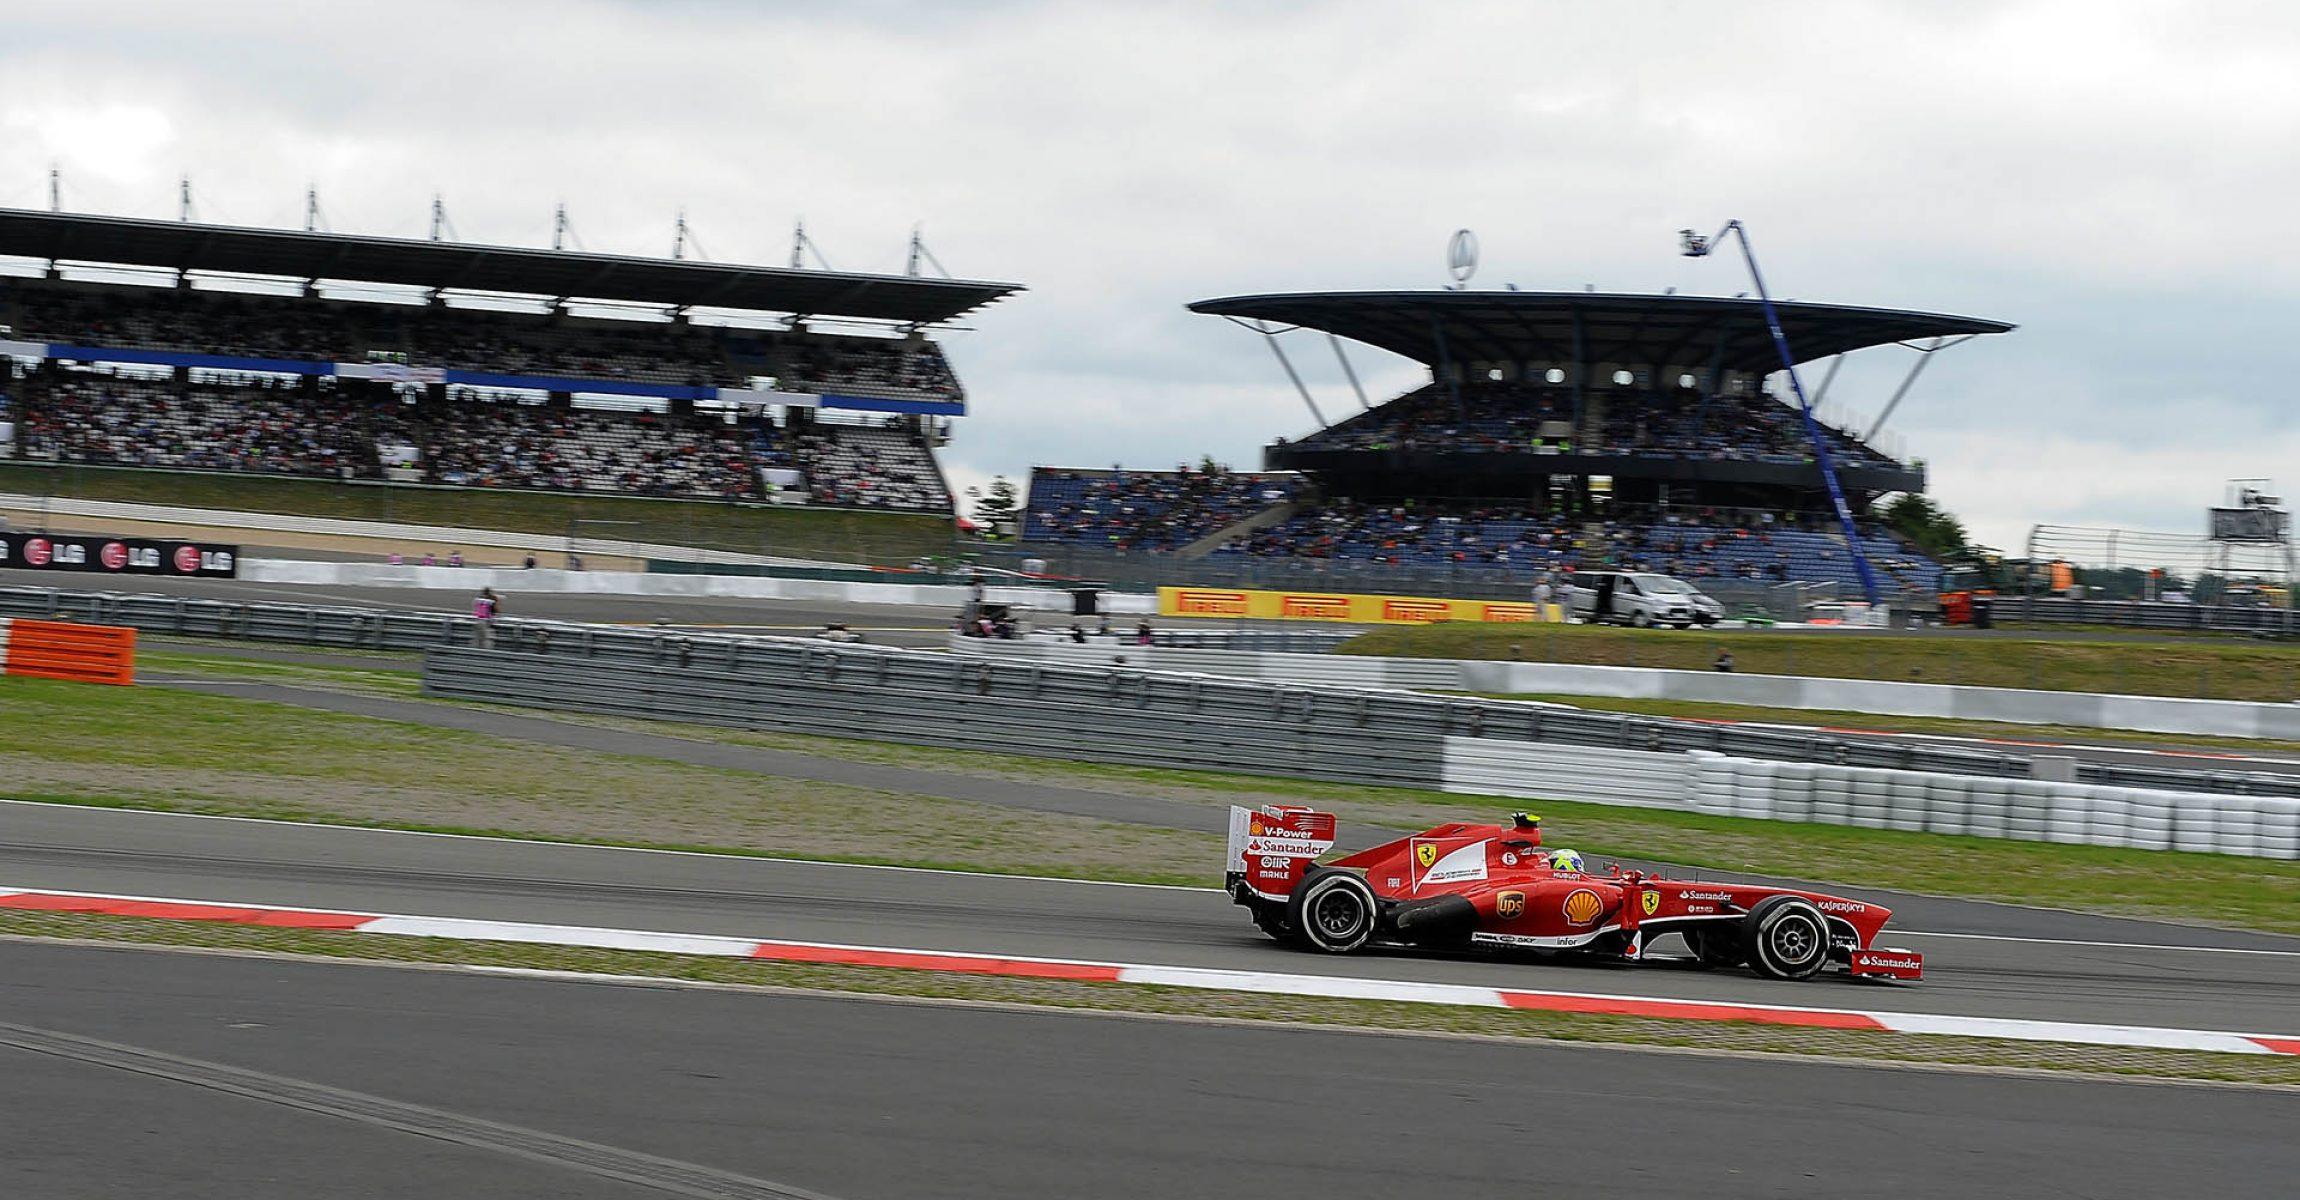 NUERBURGRING (GERMANIA) - 05/07/2013 © FOTO STUDIO COLOMBO X FERRARI Felipe Massa, Ferrari, 2013 German Grand Prix Nürburgring